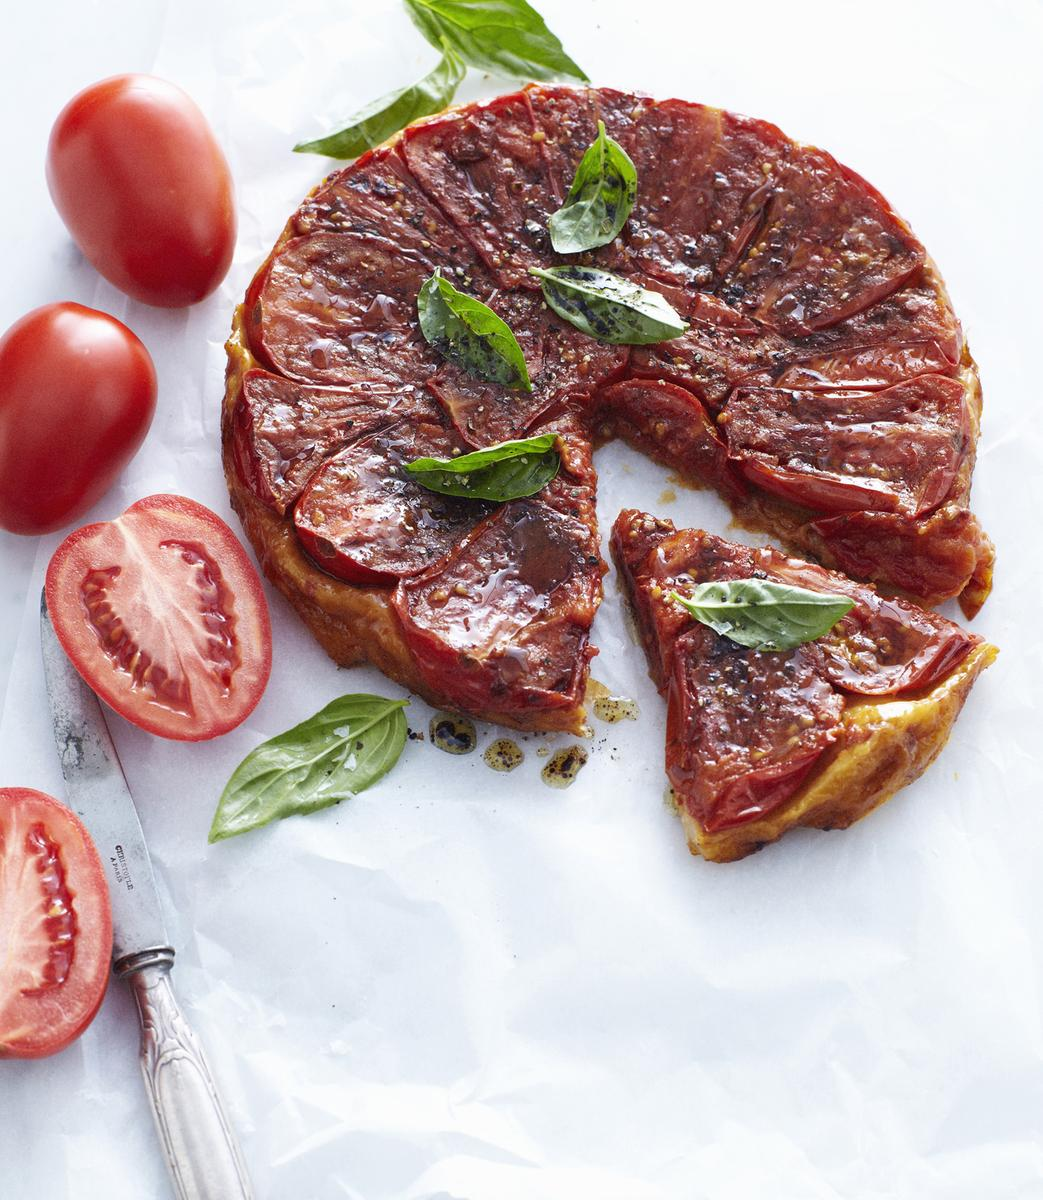 Recette tatins de tomates cerises la tapenade cuisine - Madame figaro cuisine ...